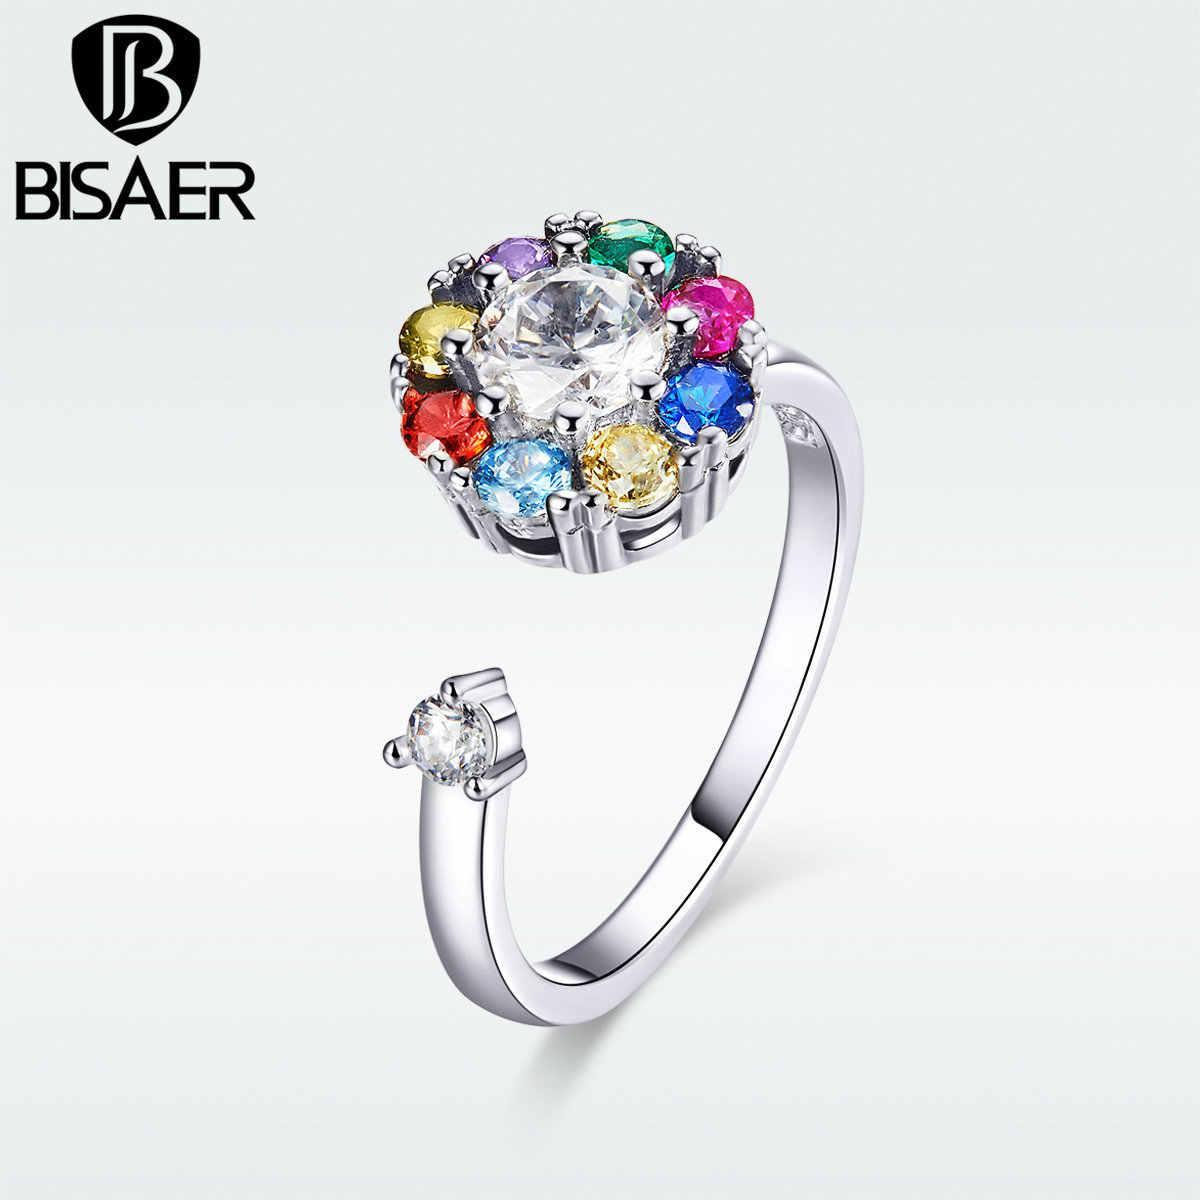 BISAER Flower แหวนเงินสี Rainbow Whirling ดอกไม้ปรับนิ้วมือแหวน Cubic Zircon เครื่องประดับ WEYR218